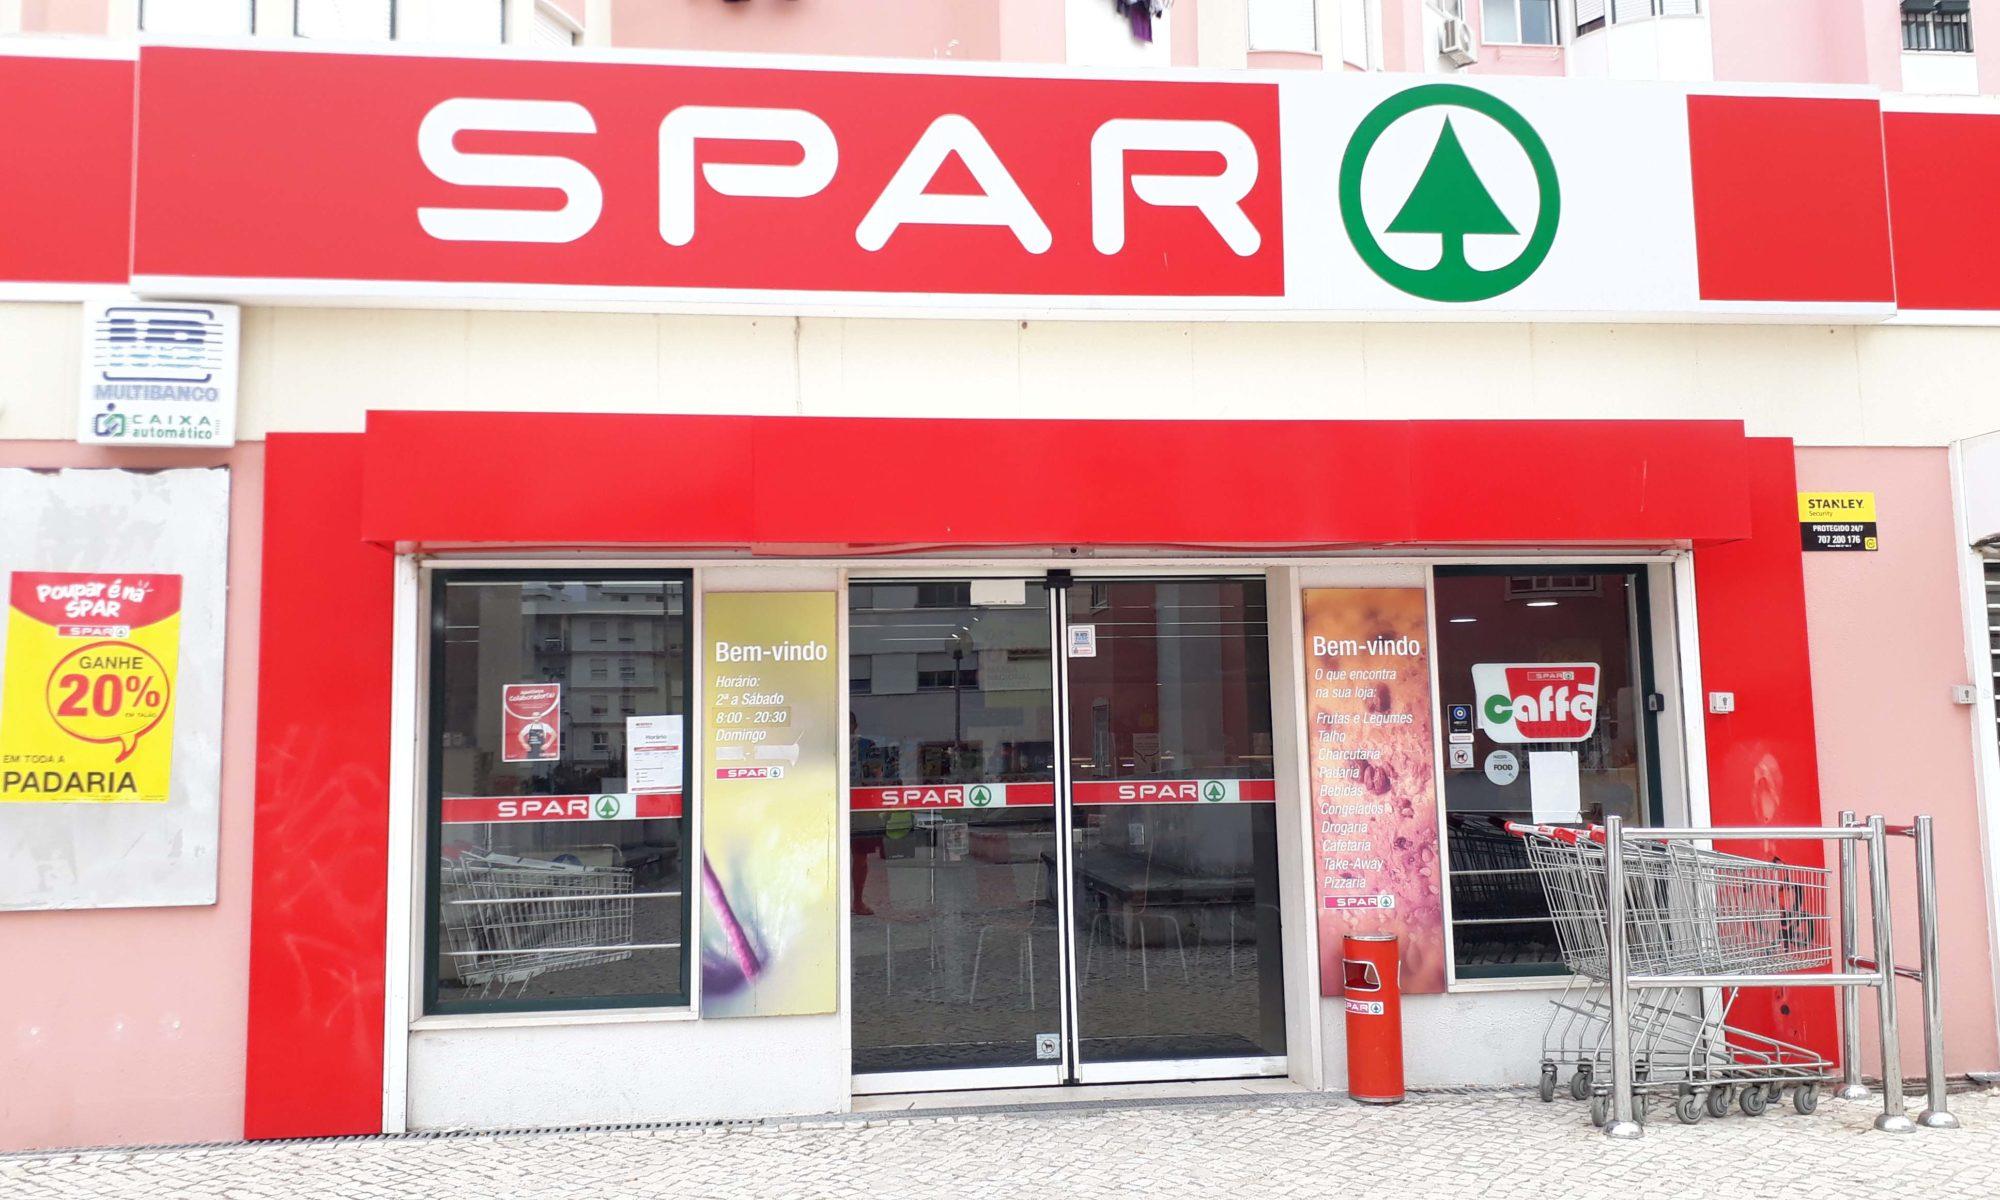 Vegane Produkte bei Spar in Portugal